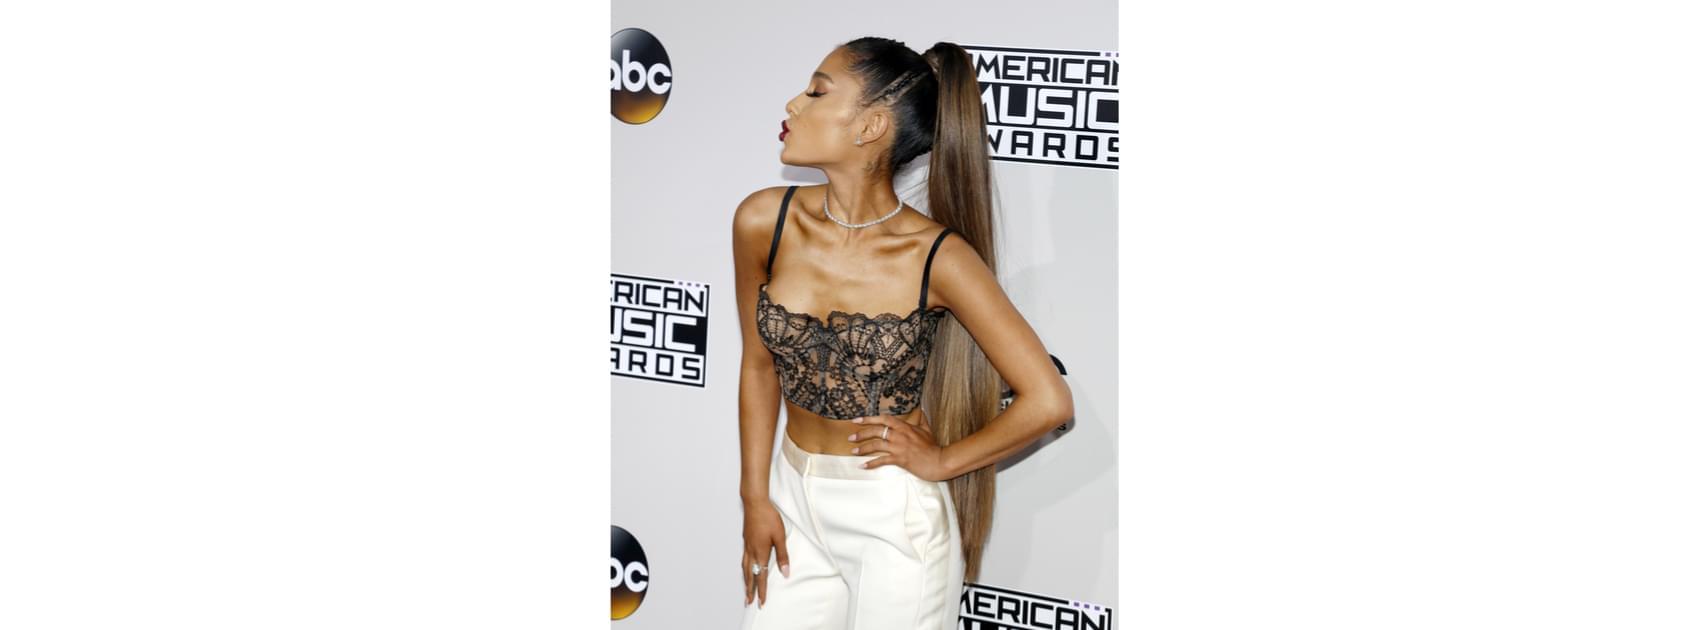 Ariana Grande Celebrates Birthday with New Song